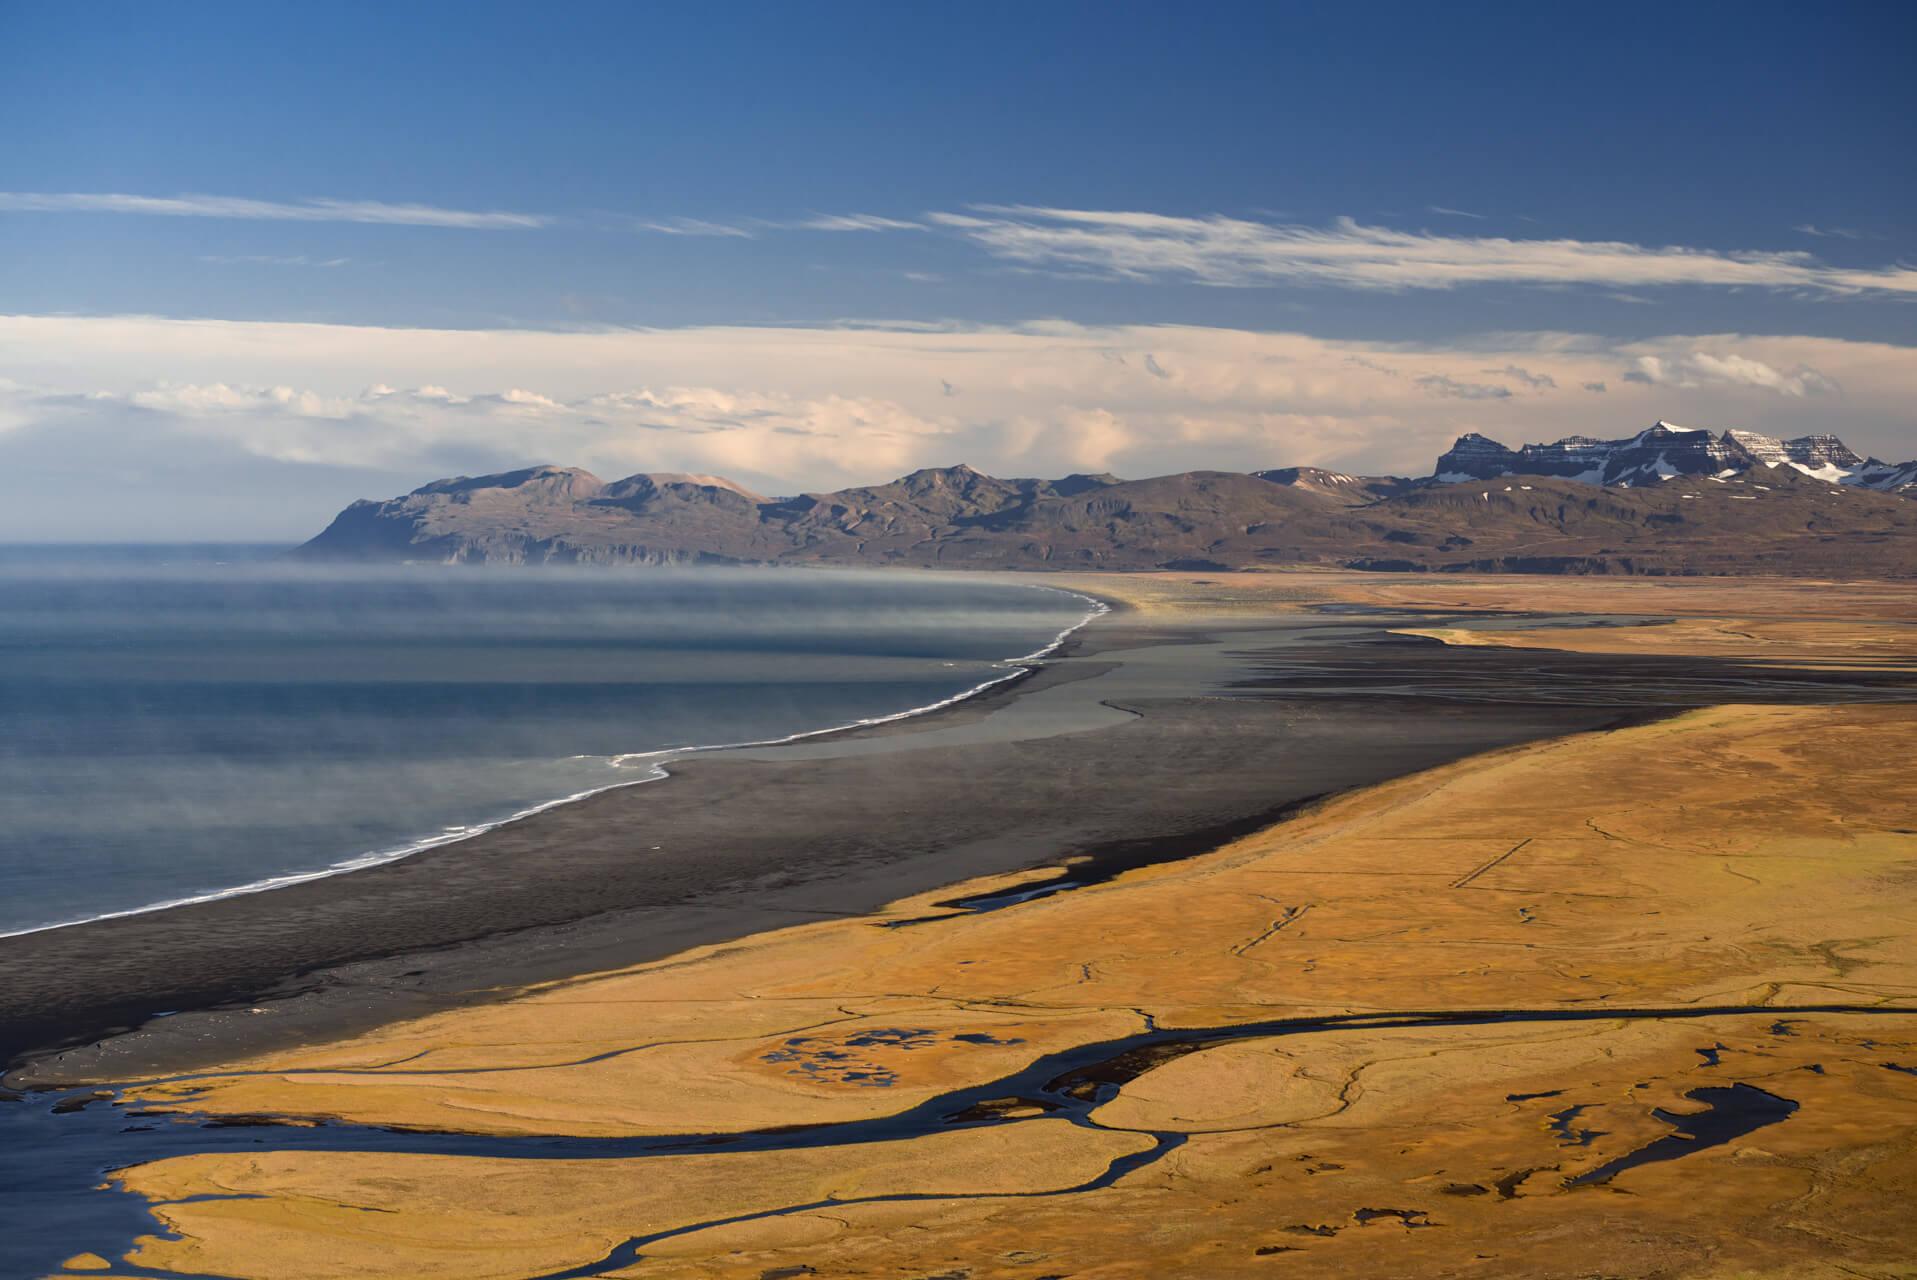 Island, Holmatunga; Fotograf Steffen Lohse